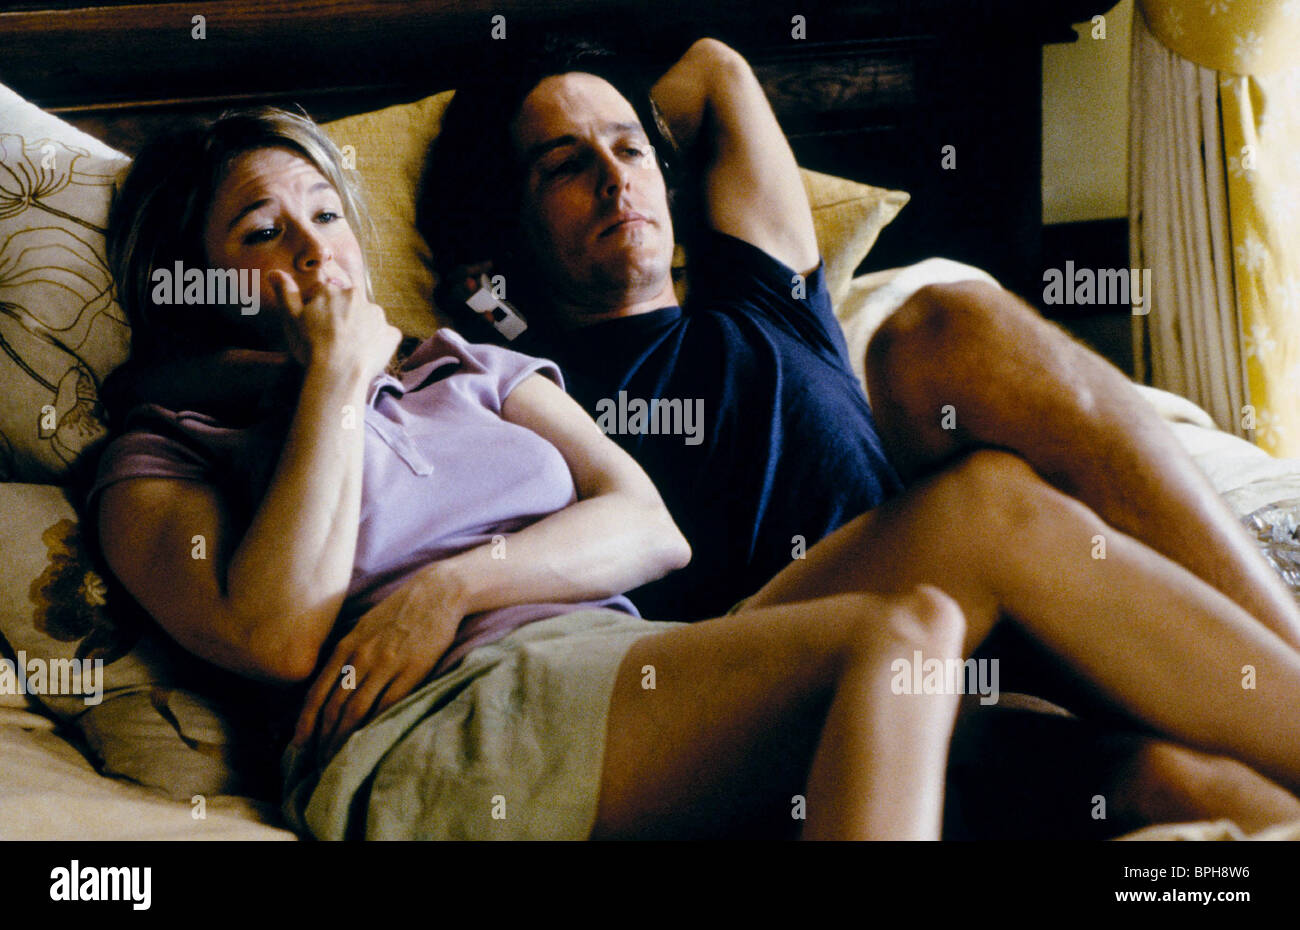 Renee Zellweger Hugh Grant Bridget Jones S Diary 2001 Stock Photo Alamy